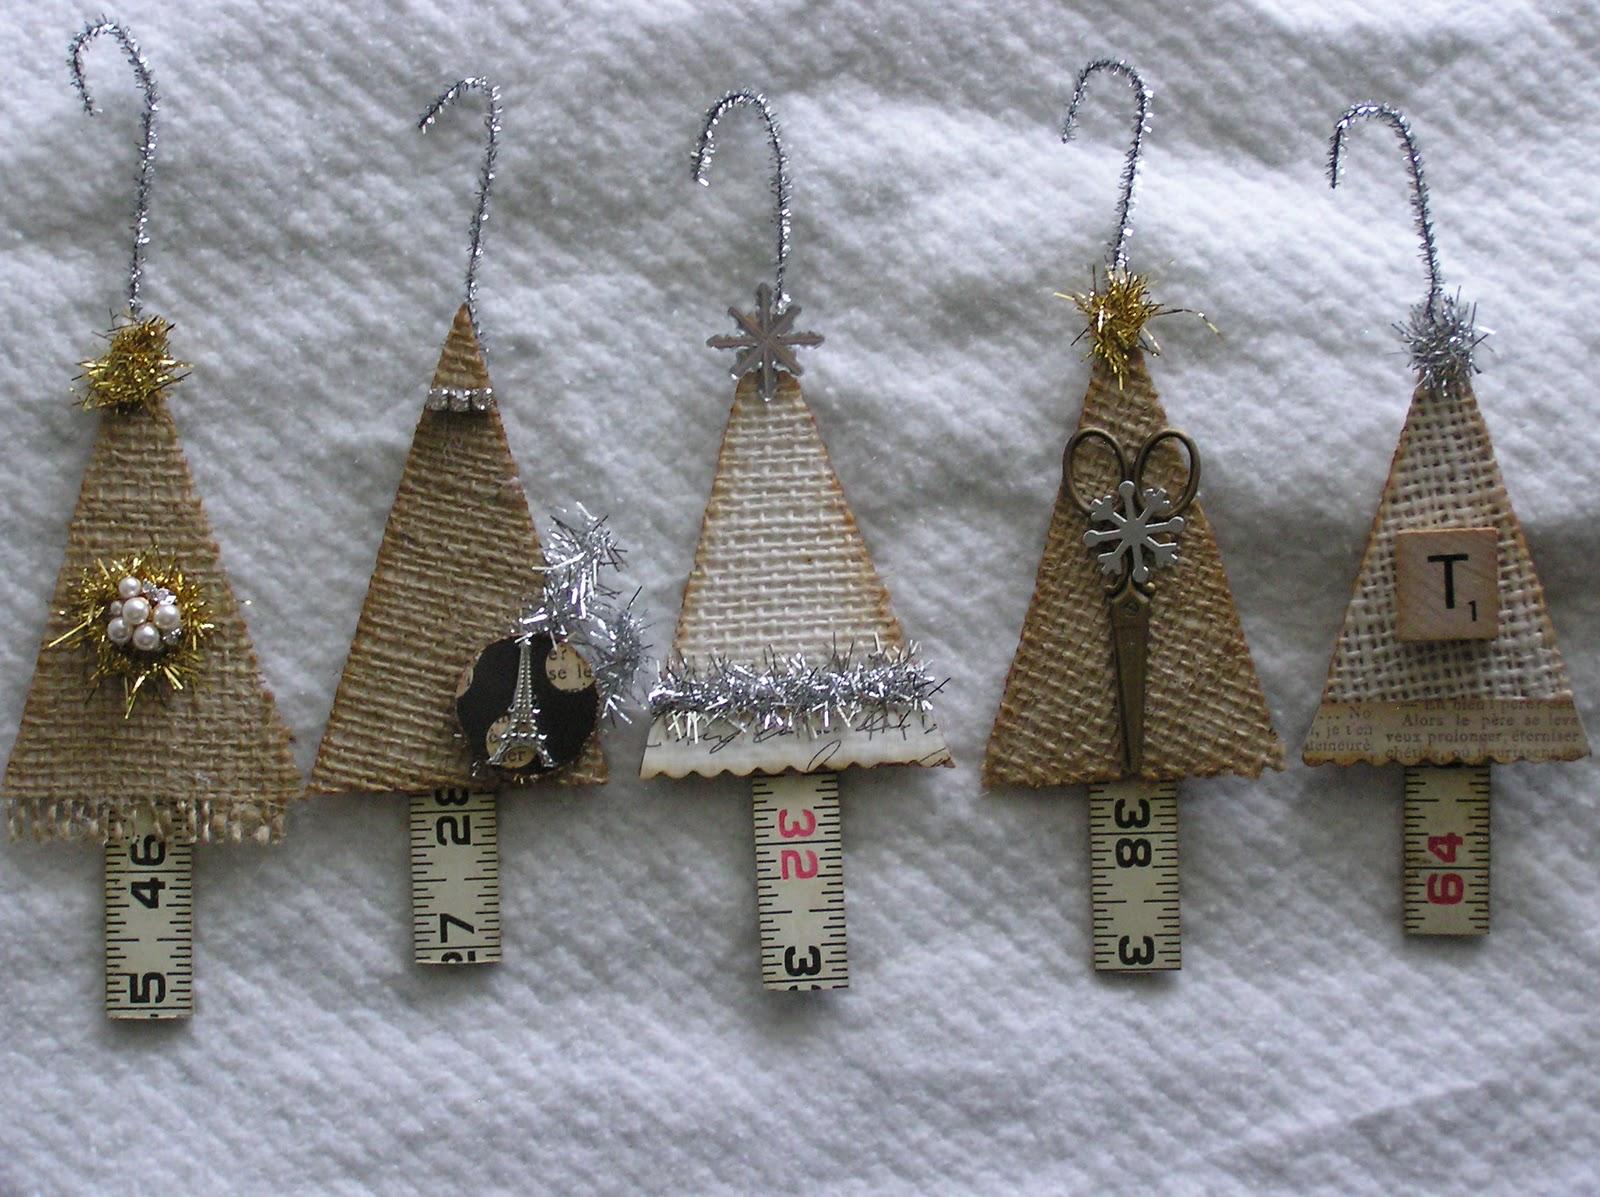 Honey girl studio december 2011 for Burlap christmas decorations to make